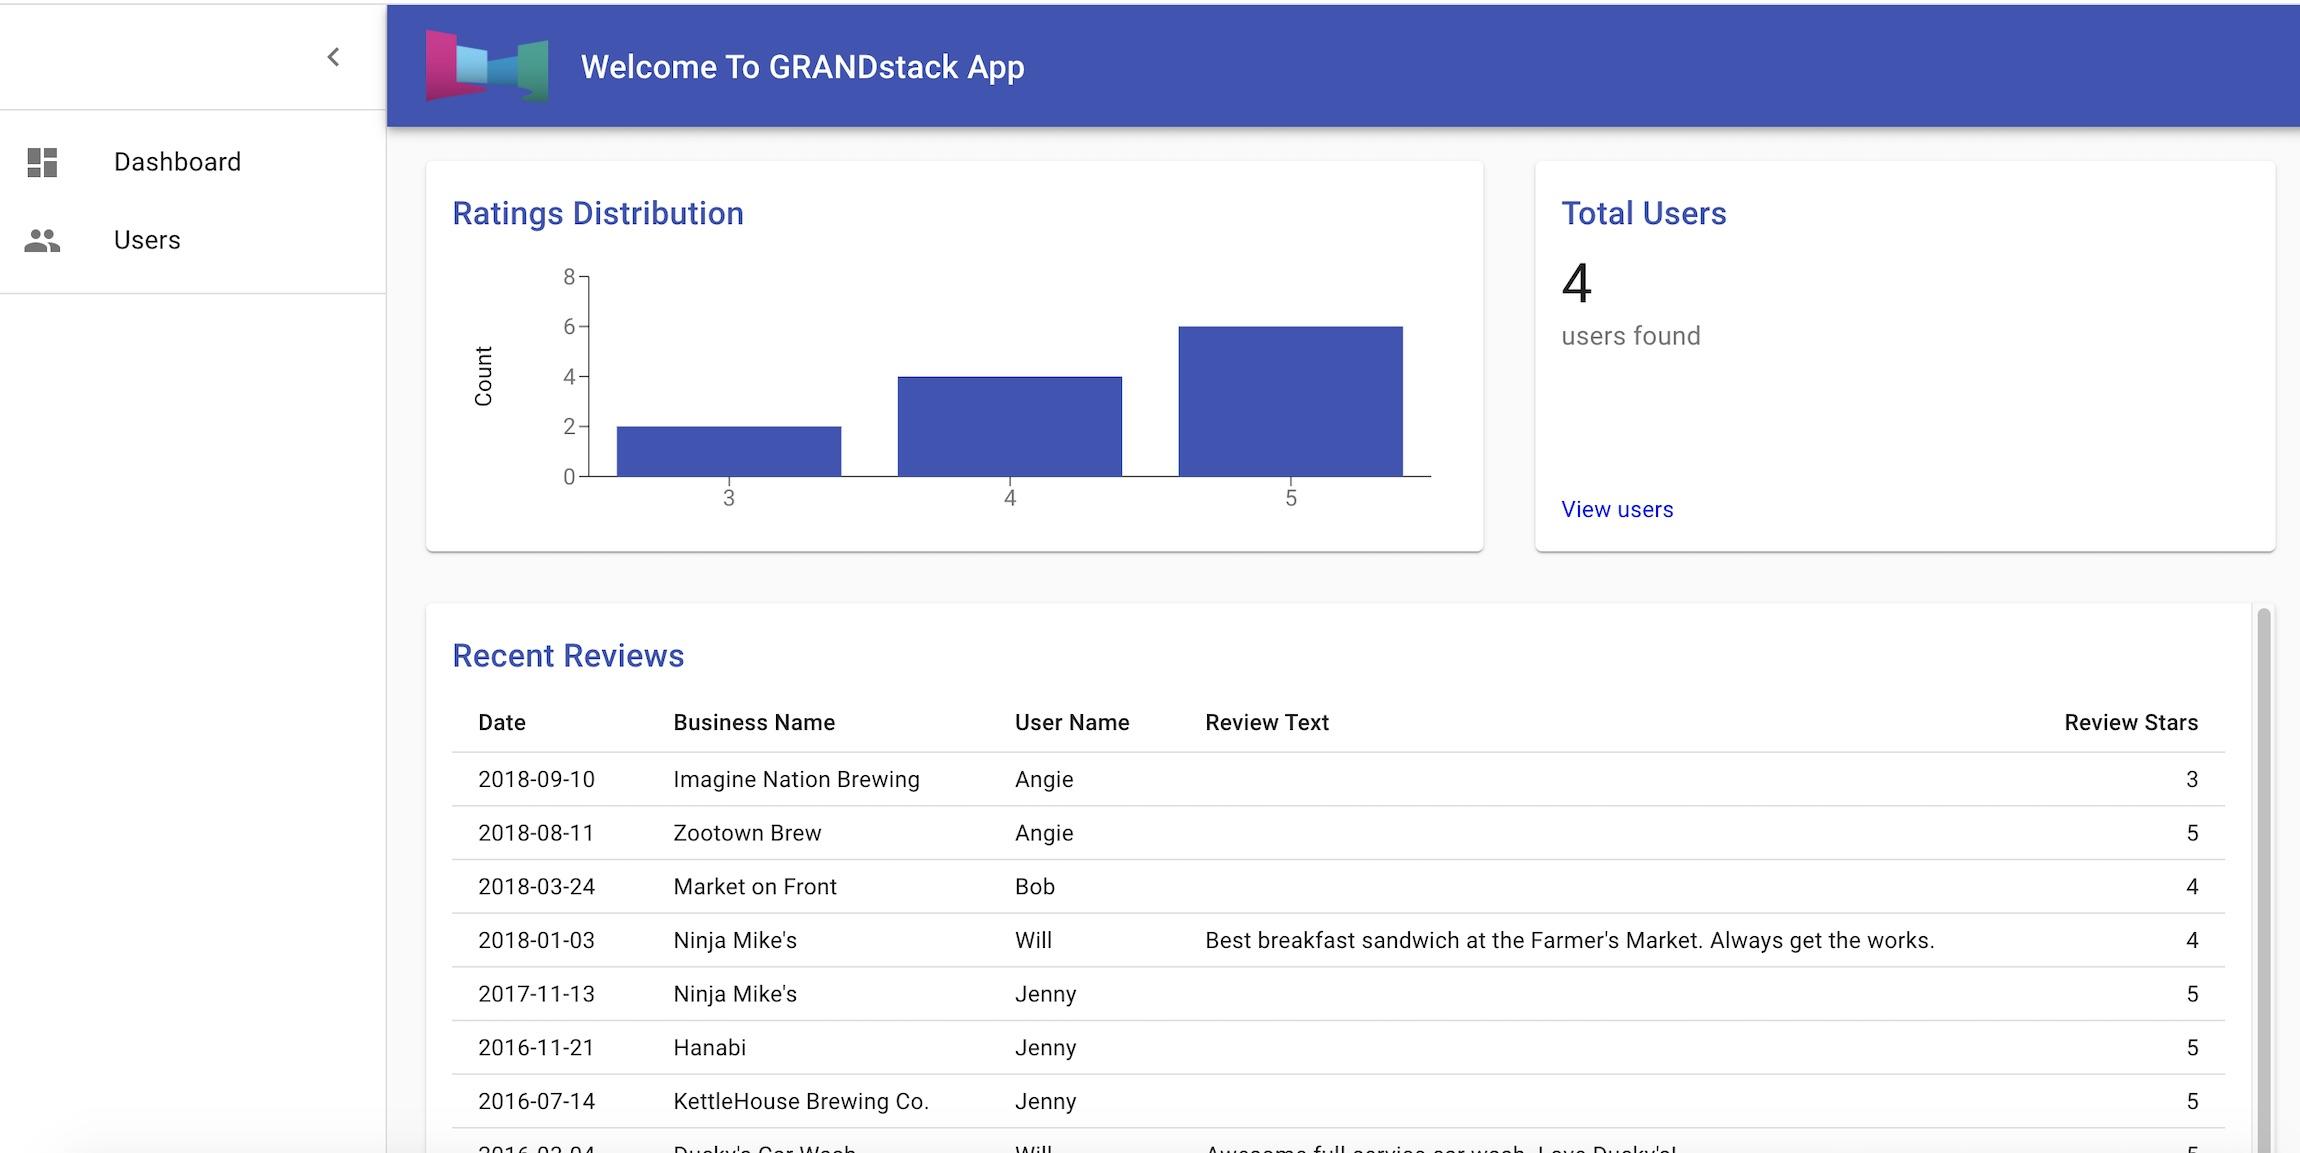 Neo4j GRANDstack dashboard